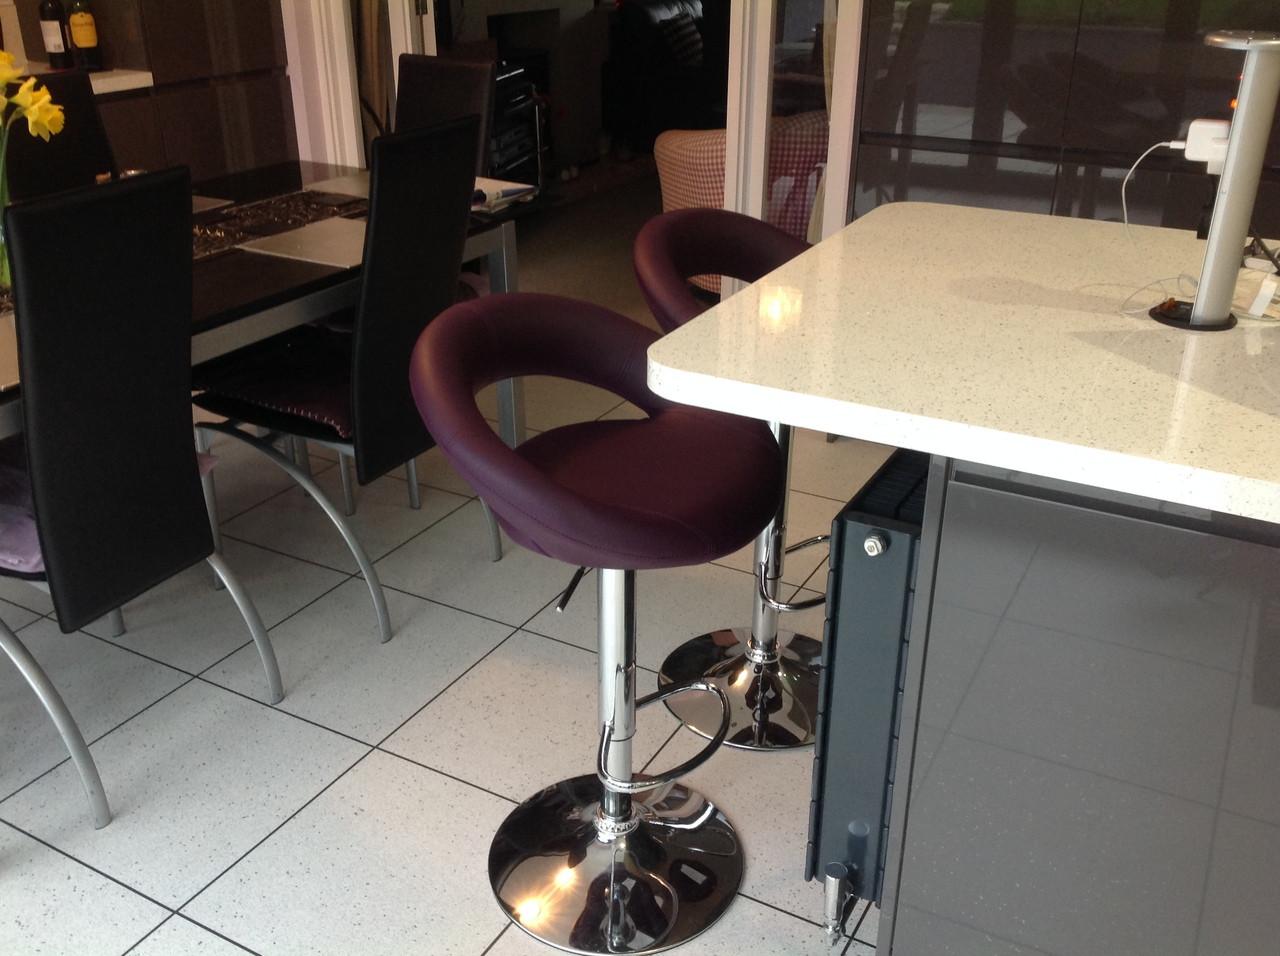 Sorrento Purple Bar Stool Breakfast Bar Stools : sorrentokitchenbarstoolpurple715111499770803 from www.simplybarstools.co.uk size 1280 x 956 jpeg 374kB